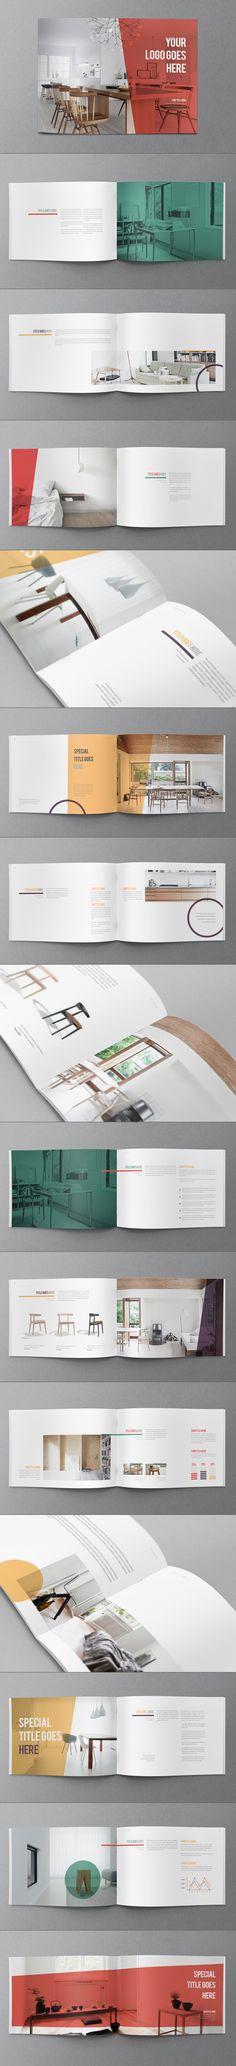 Colorful Minimal Brochure on Behance